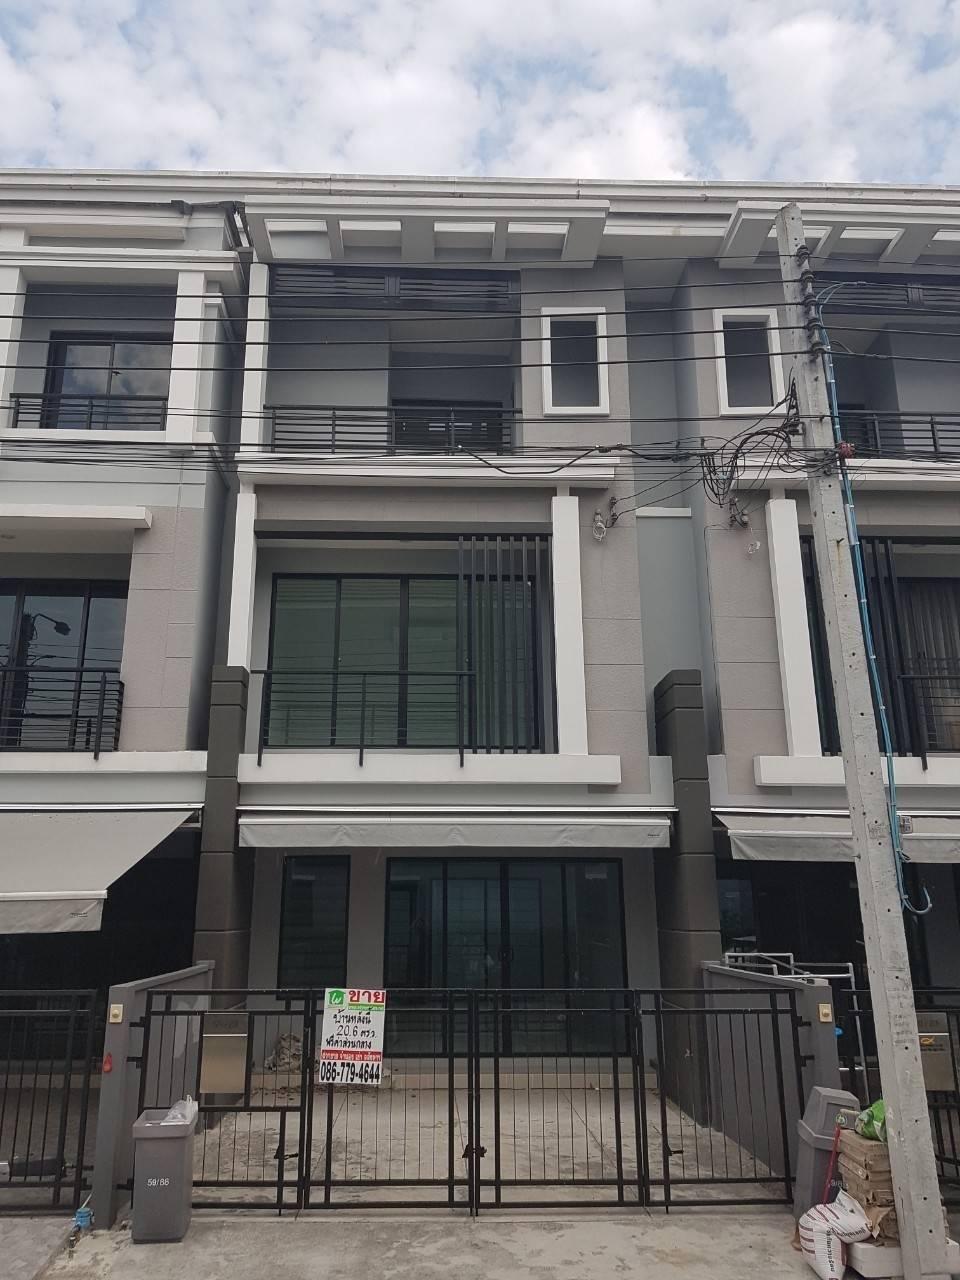 Townhome for sale in Baan Klang Muang, Suksawat 37,